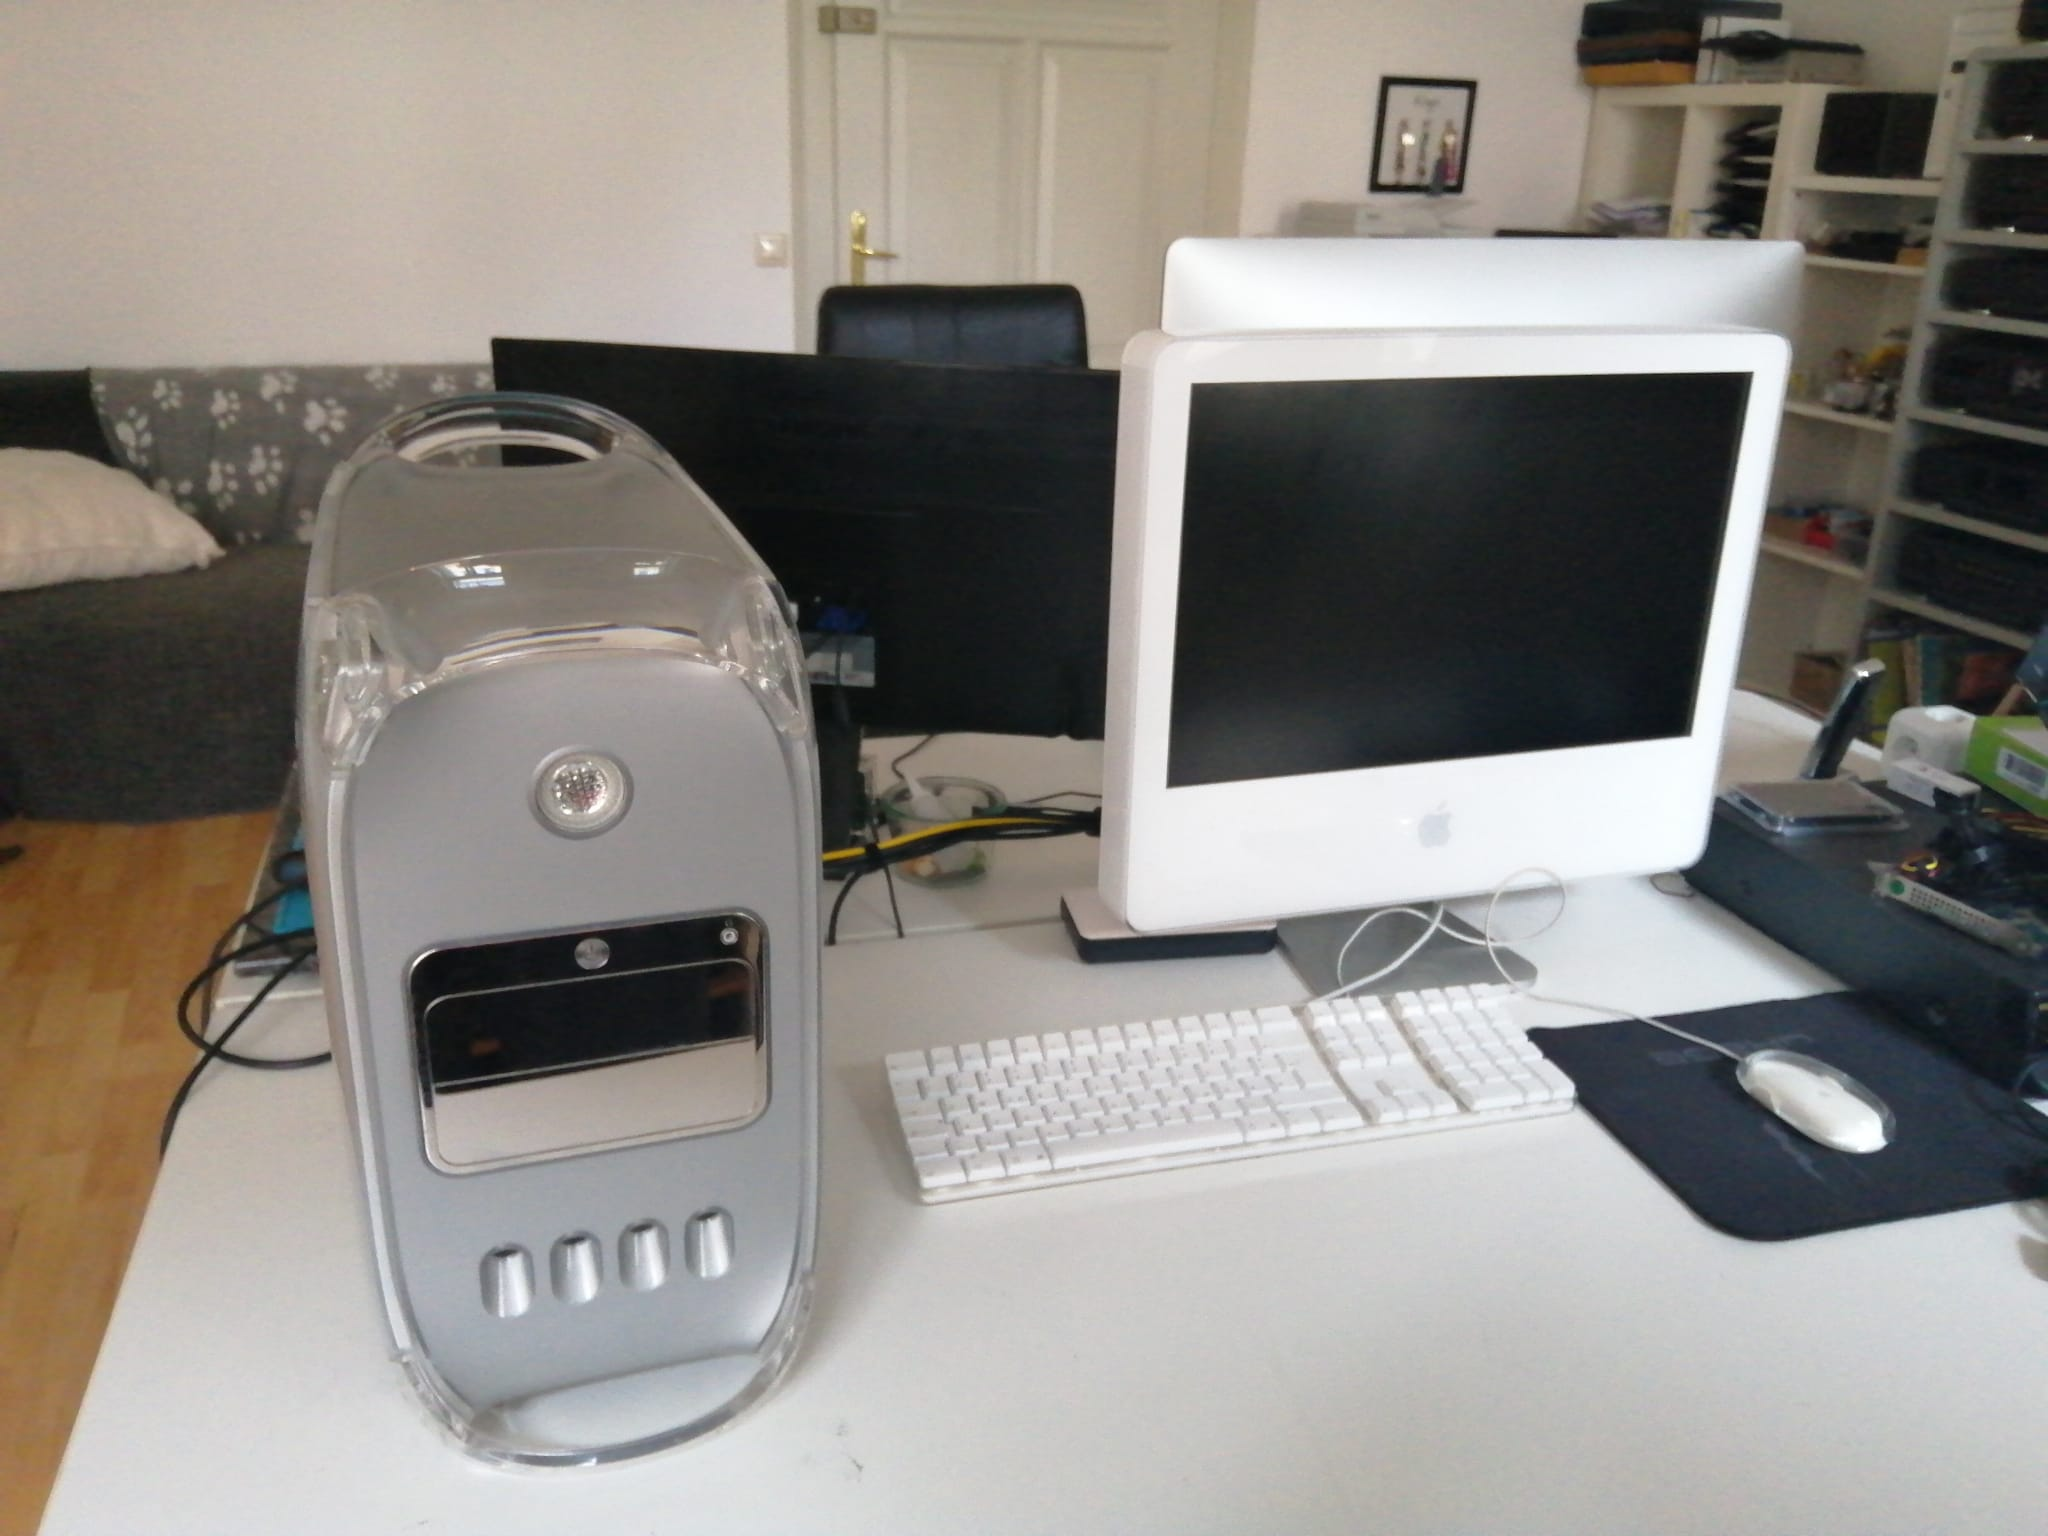 PowerMac G4 MDD und iMac G5